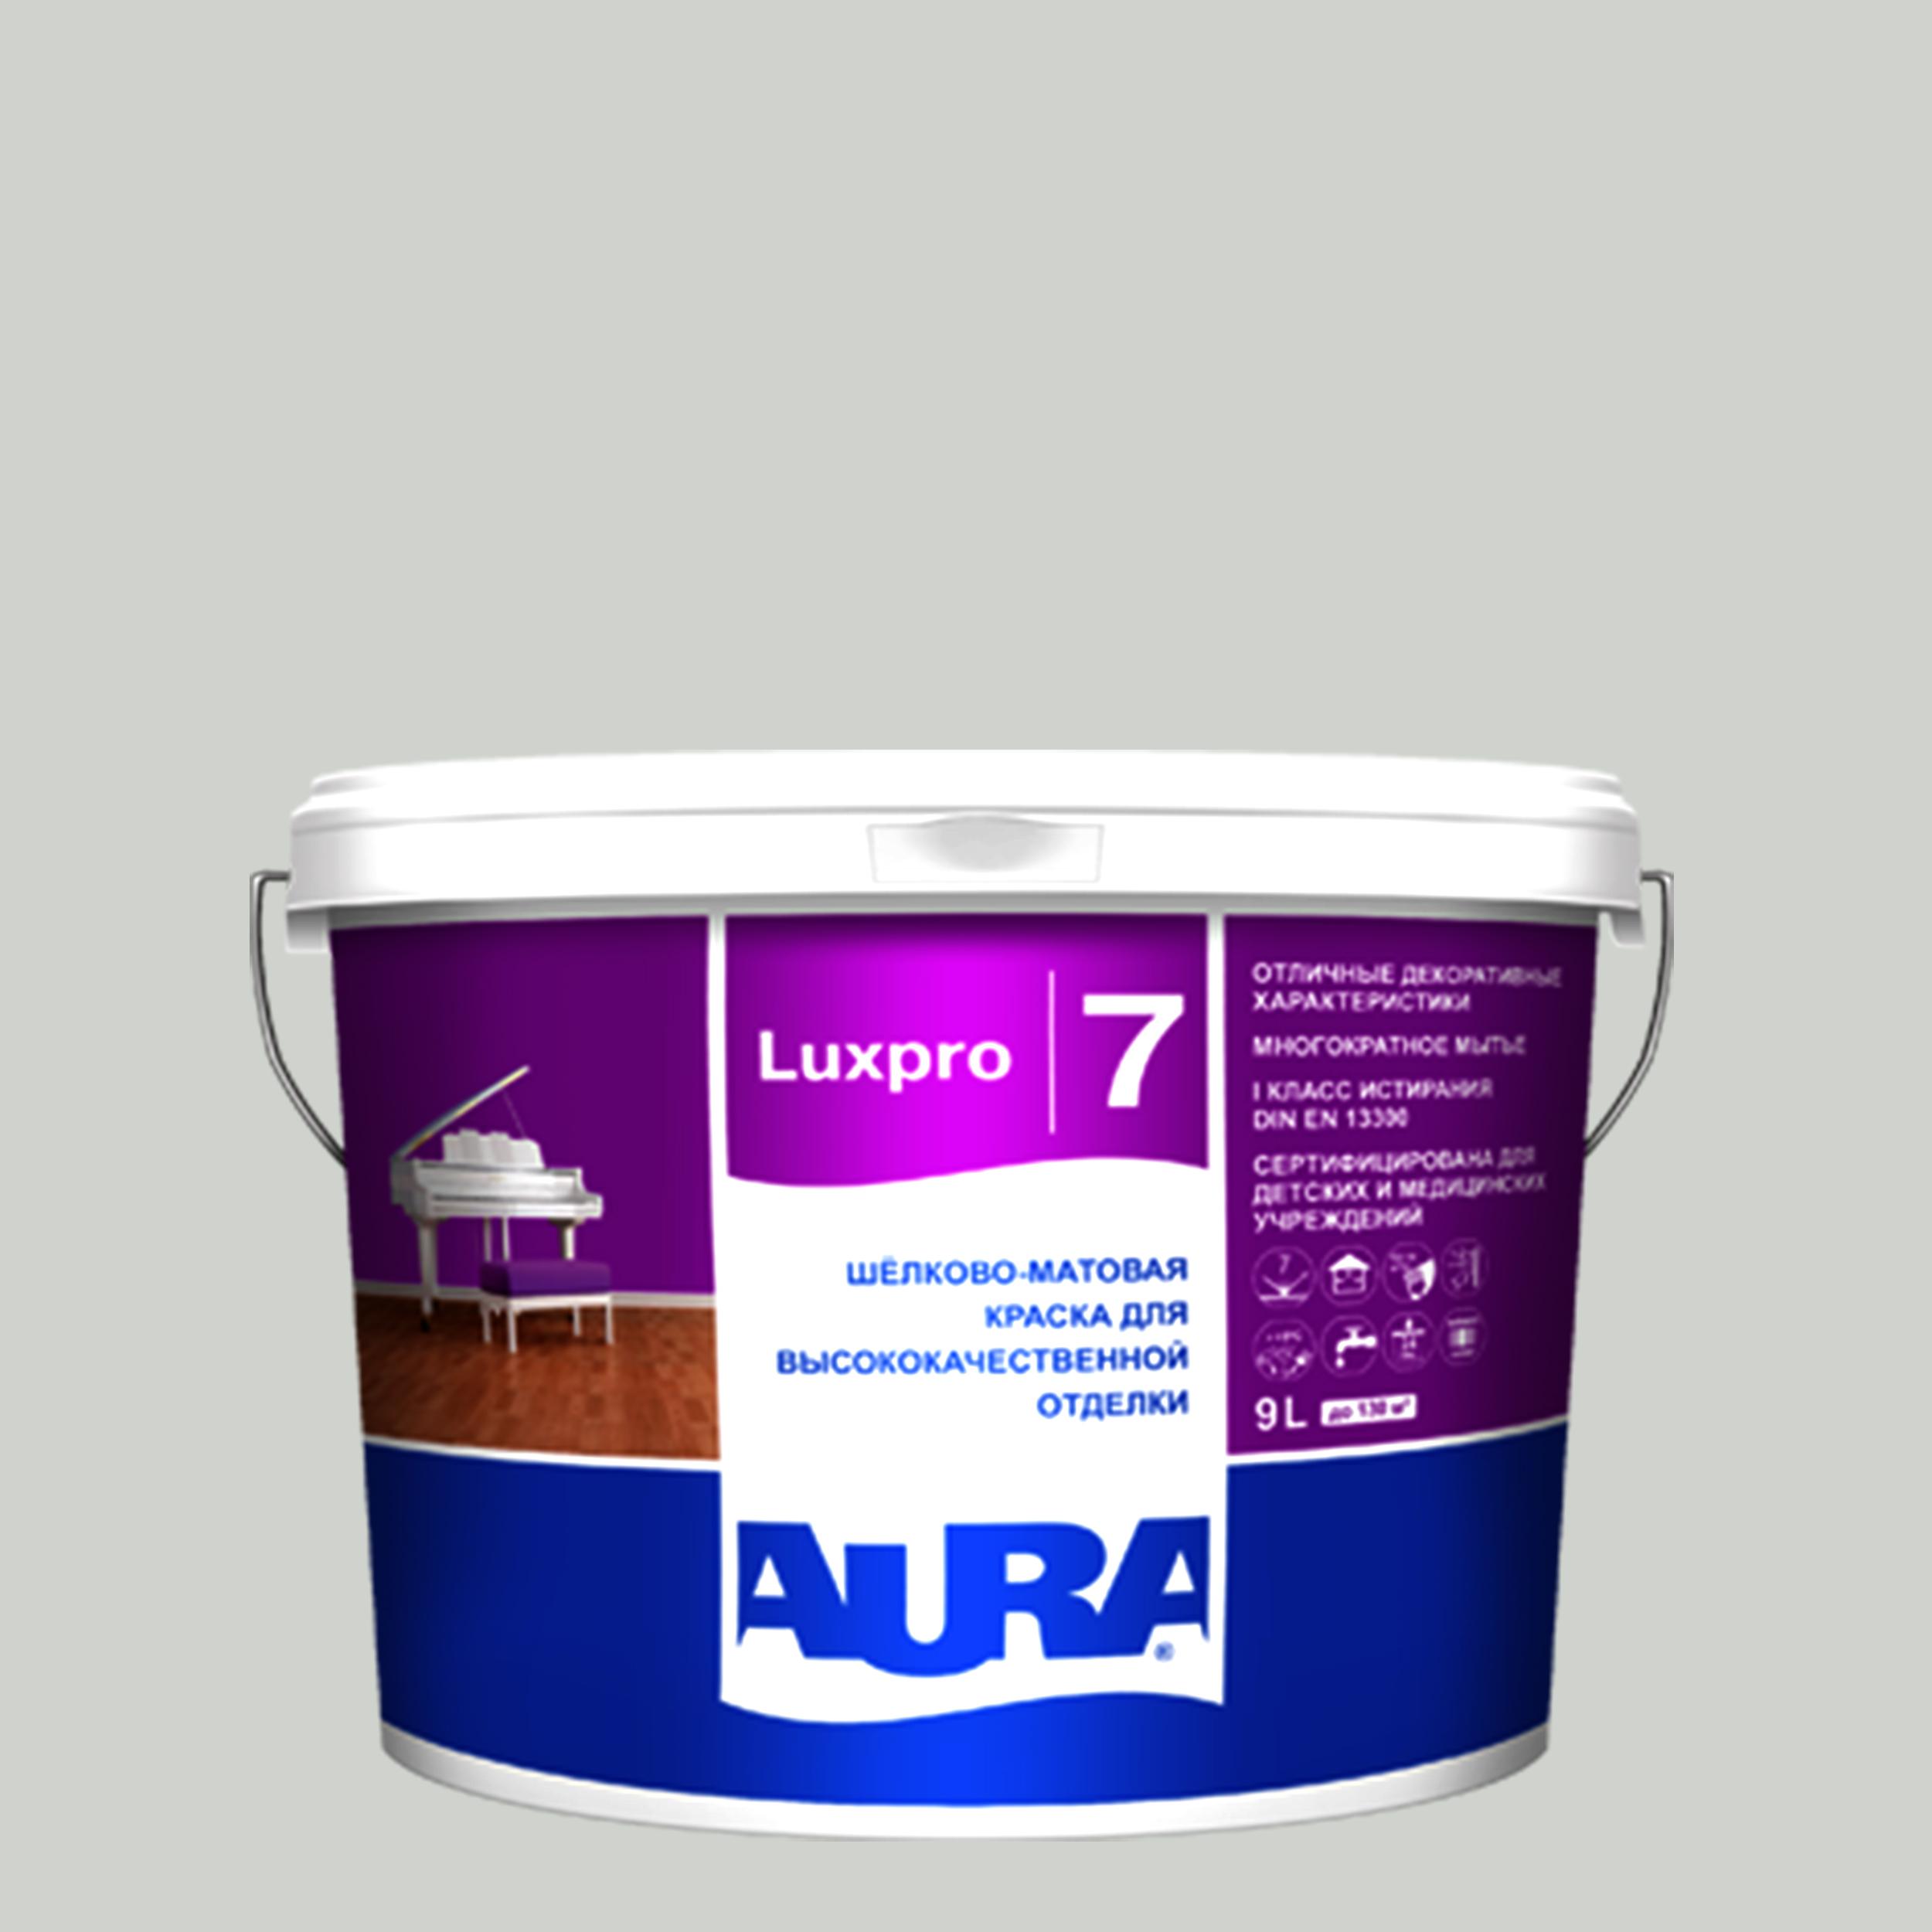 Фото 5 - Краска интерьерная, Aura LuxPRO 7, RAL 5021, 11 кг.